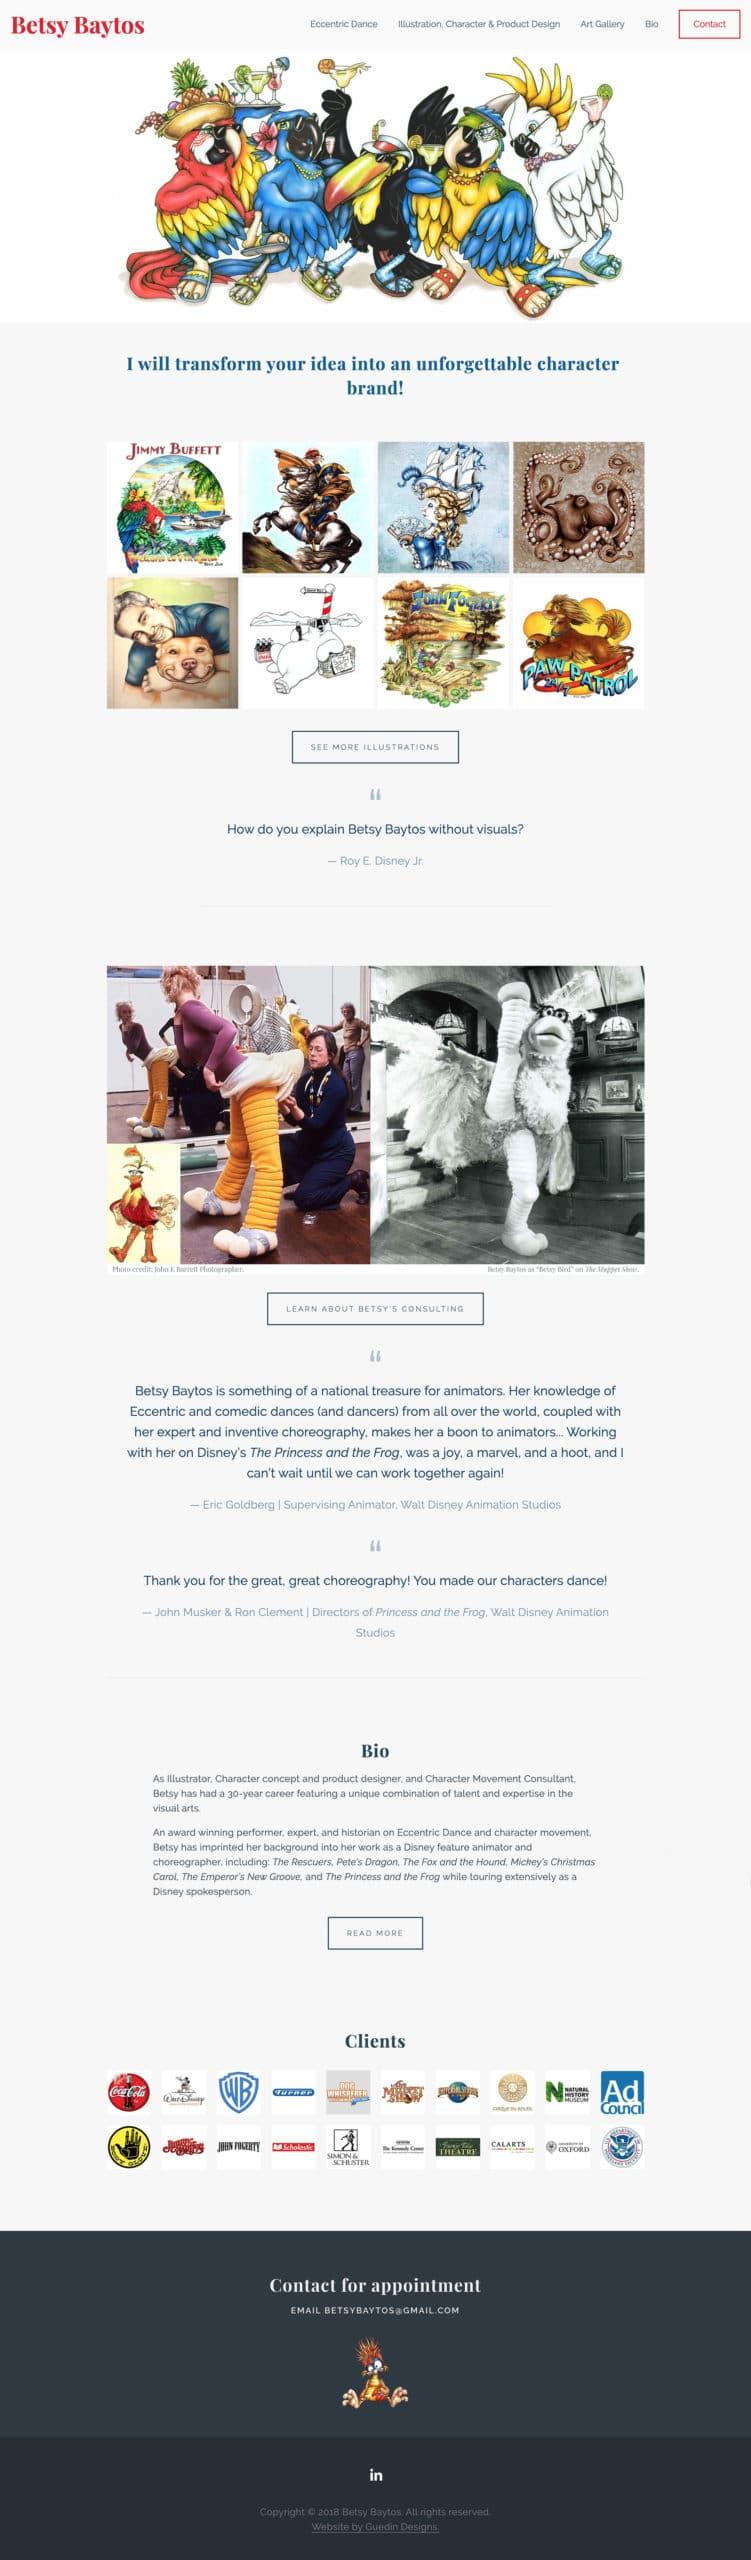 Betsy Baytos Home Page